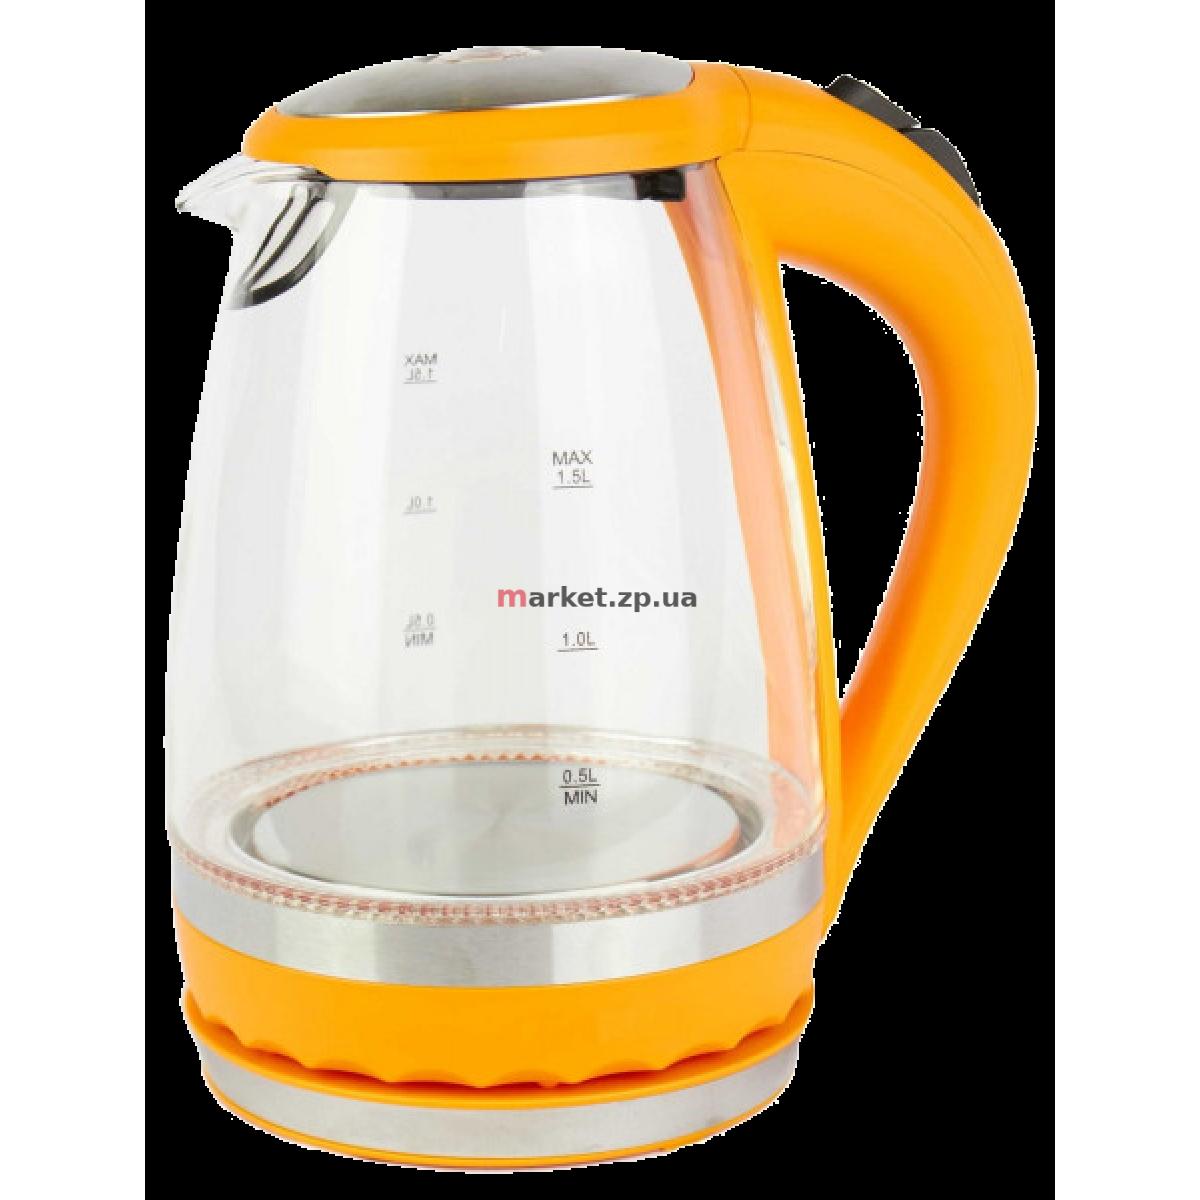 Электрочайник SMART HHB-1770 оранжевый